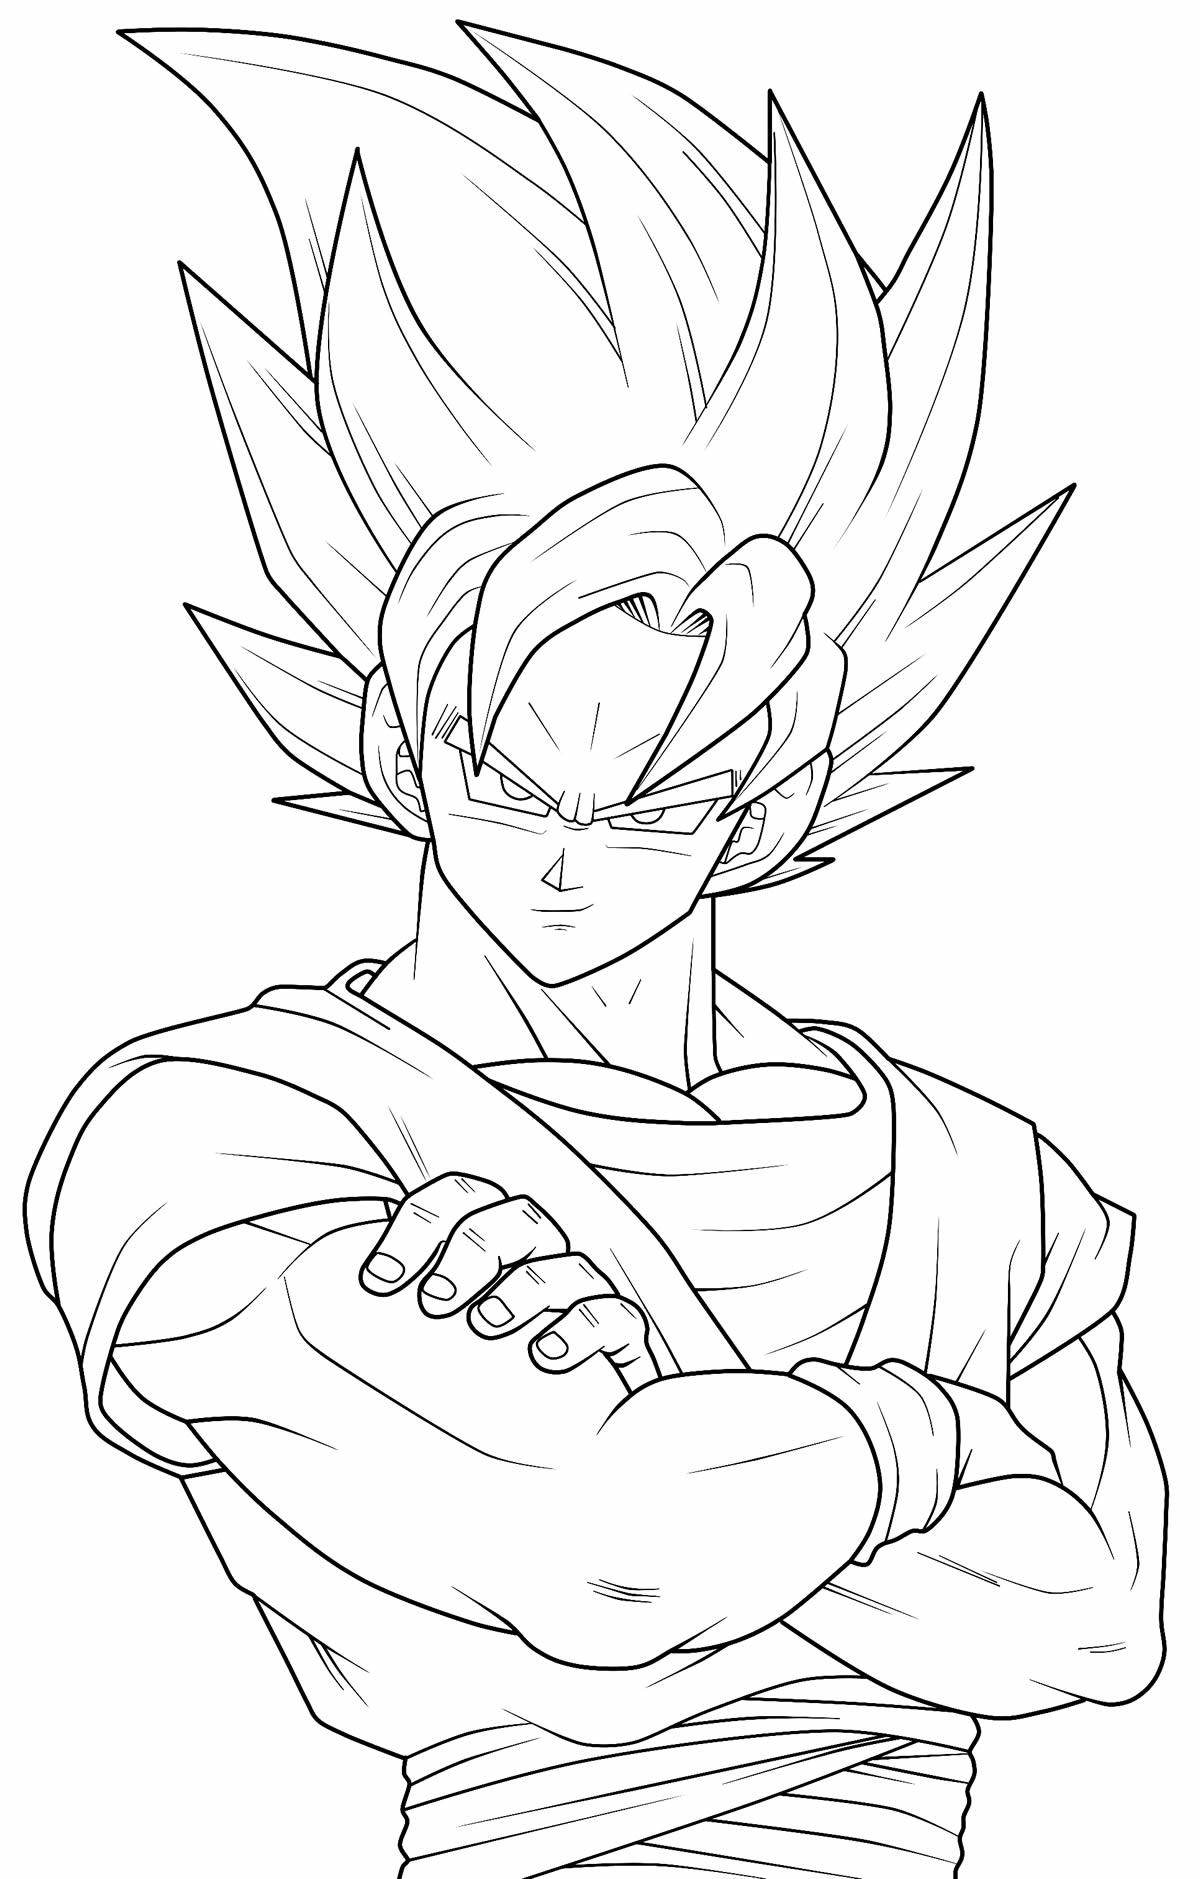 Goku coloring image